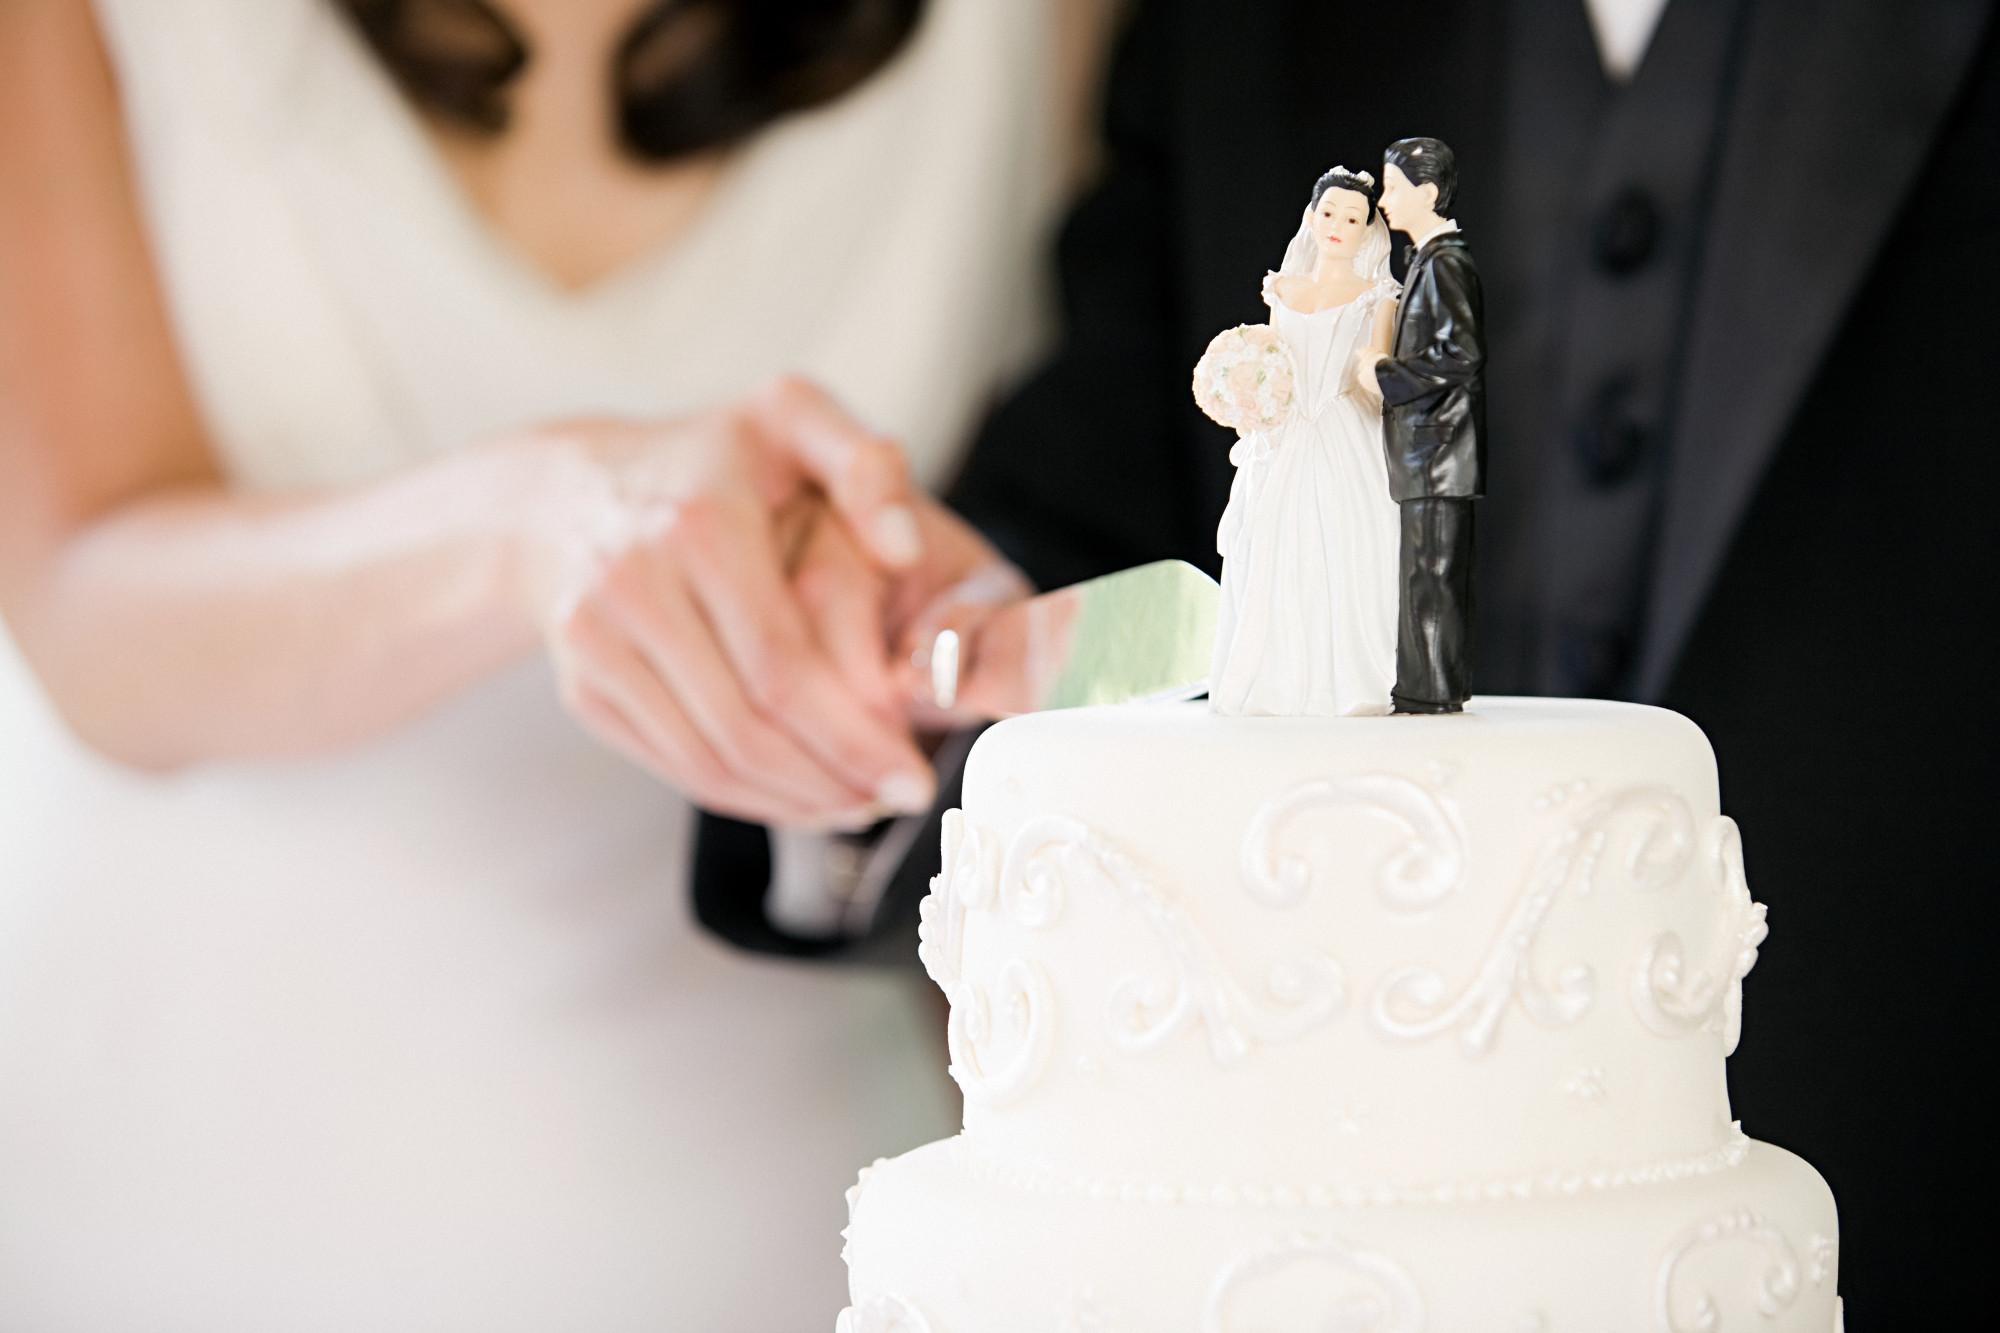 Wedding Cake Tradition One Year Anniversary